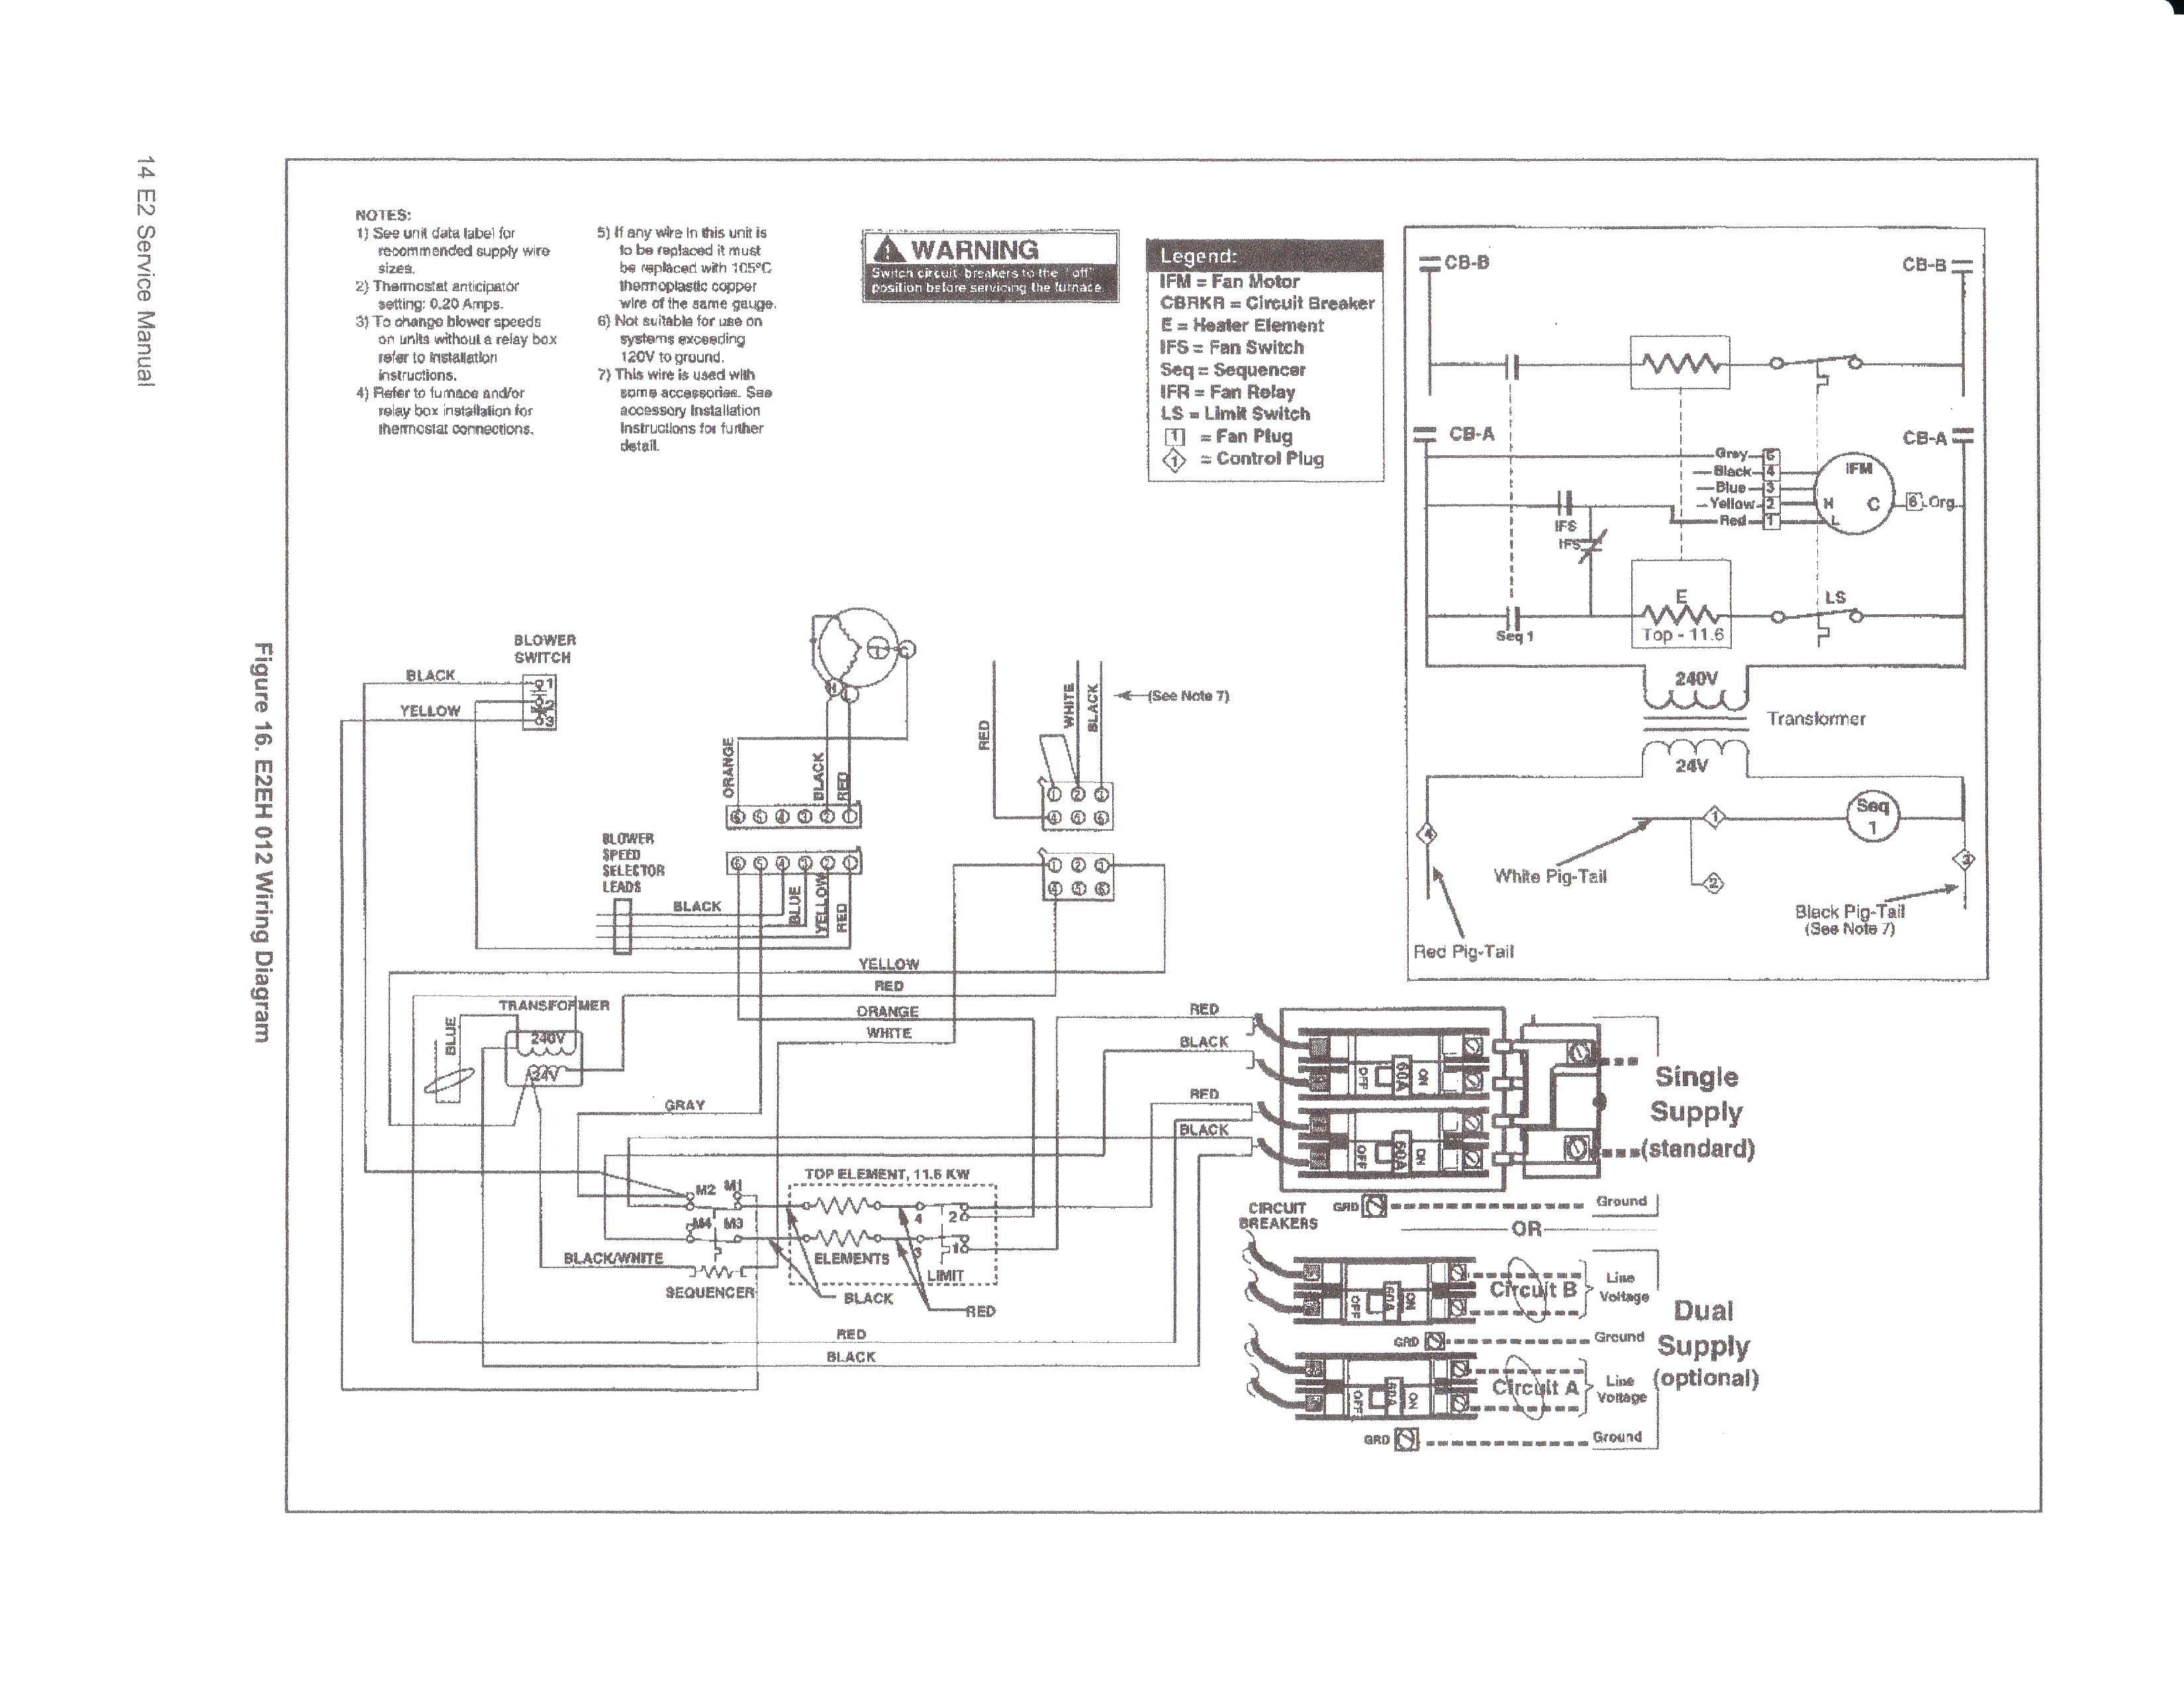 Coleman Furnace Wiring Diagram Diagramscoleman Wiring Diagramwiring Diagrams for Mobile Homes Of Coleman Furnace Wiring Diagram